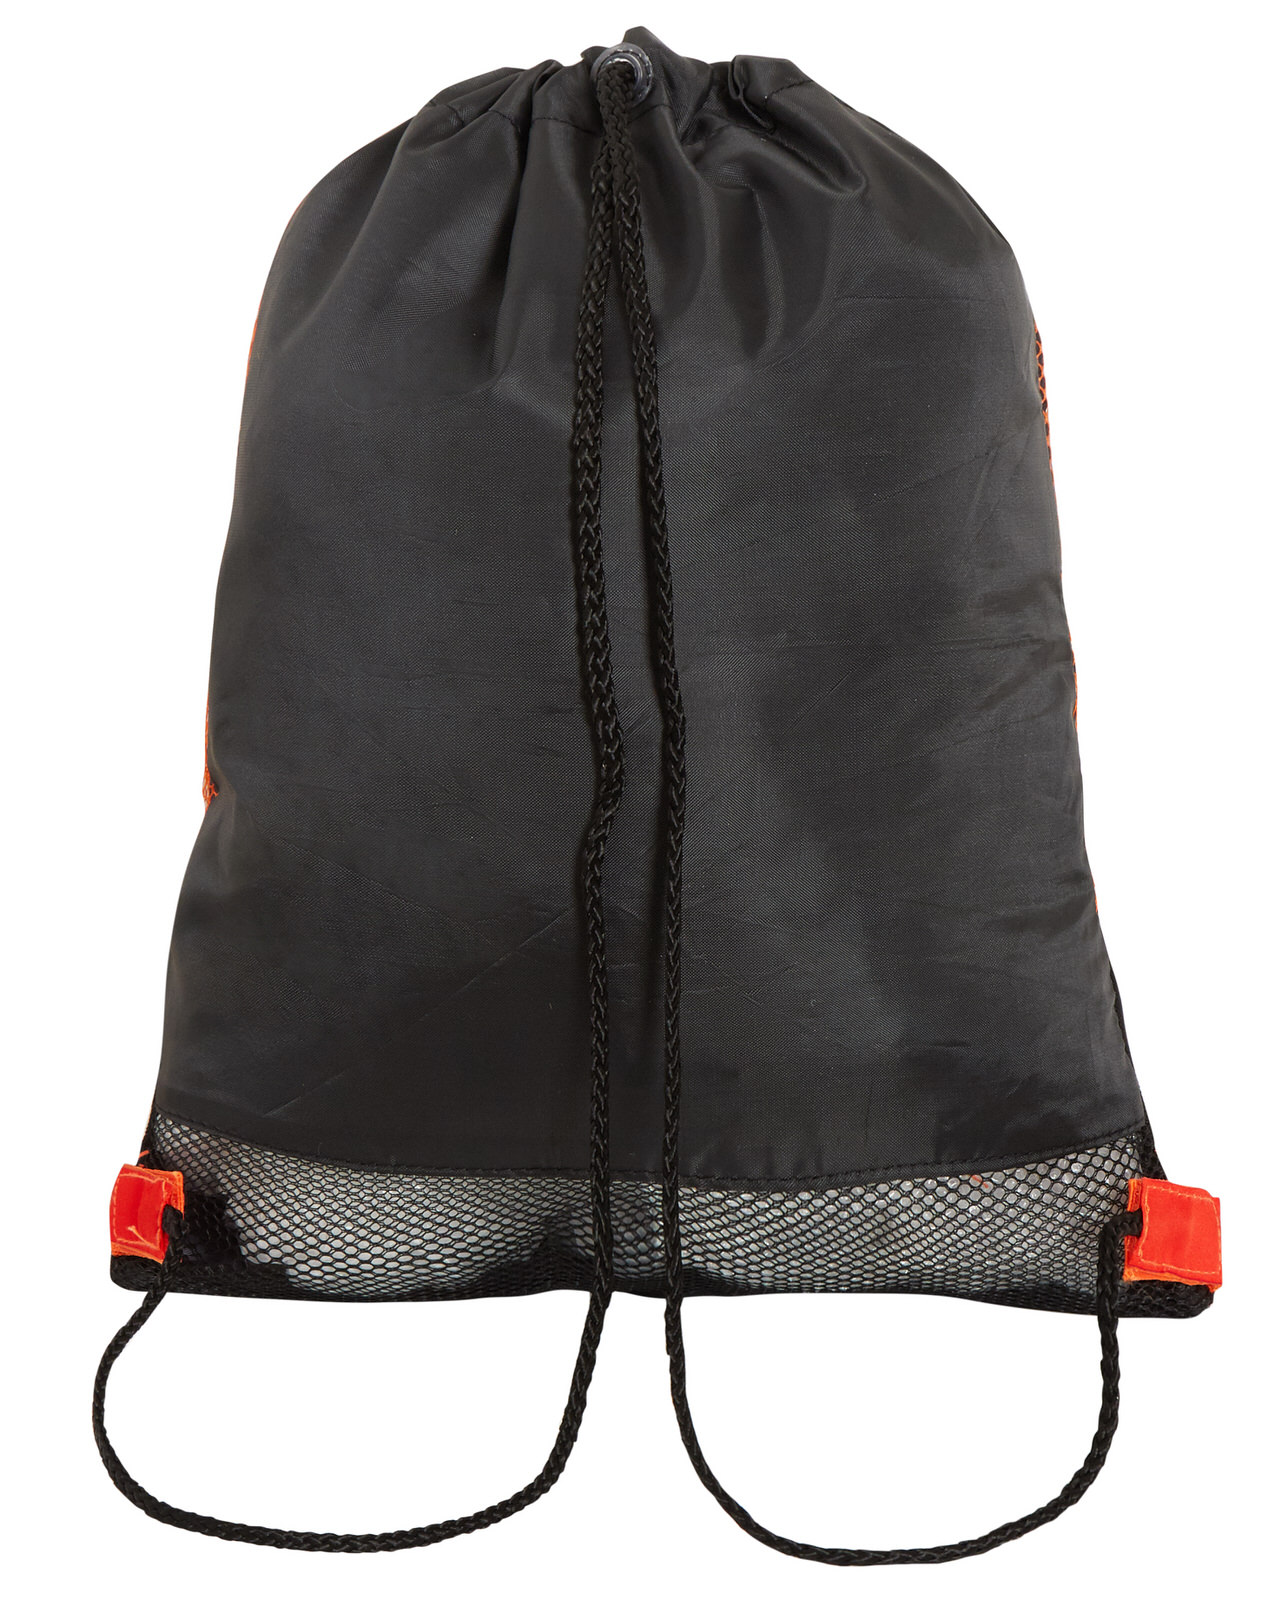 Boys Nerf Drawstring Gym Bag Kids Sports Swimming School PE Kit Bag Keyring